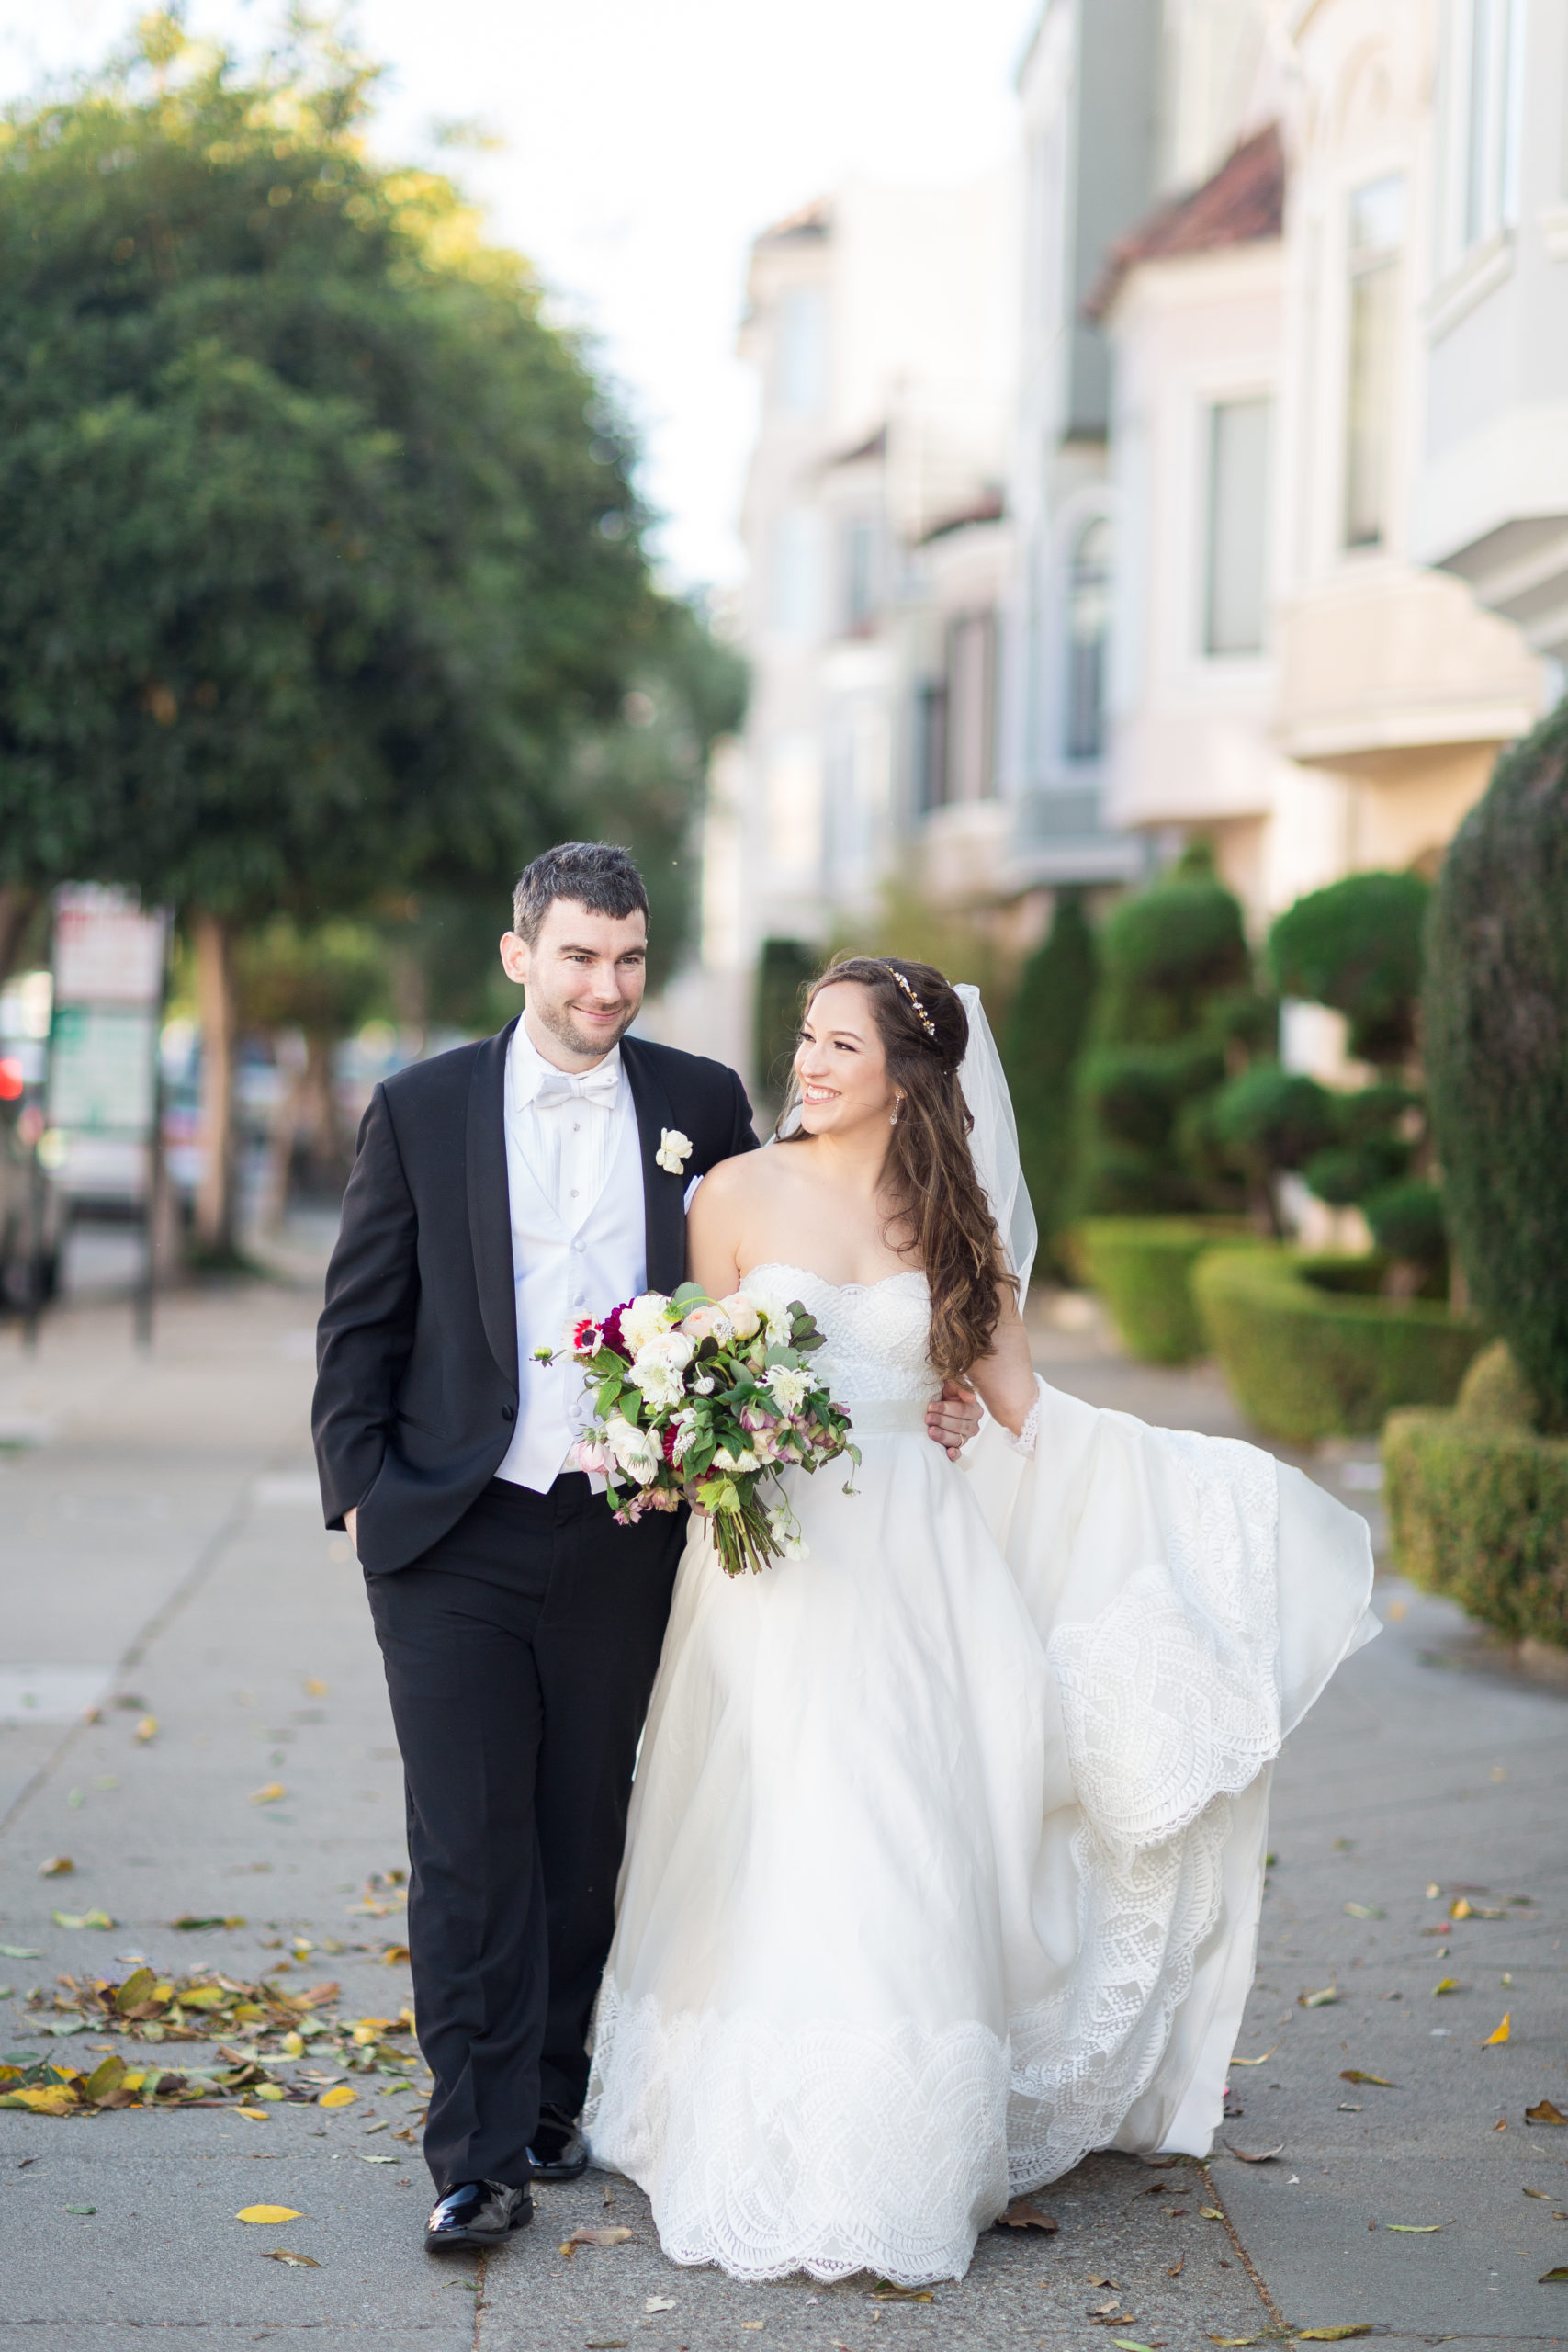 San-Francisco-Wedding-Photographer-6-1707x2560.jpg